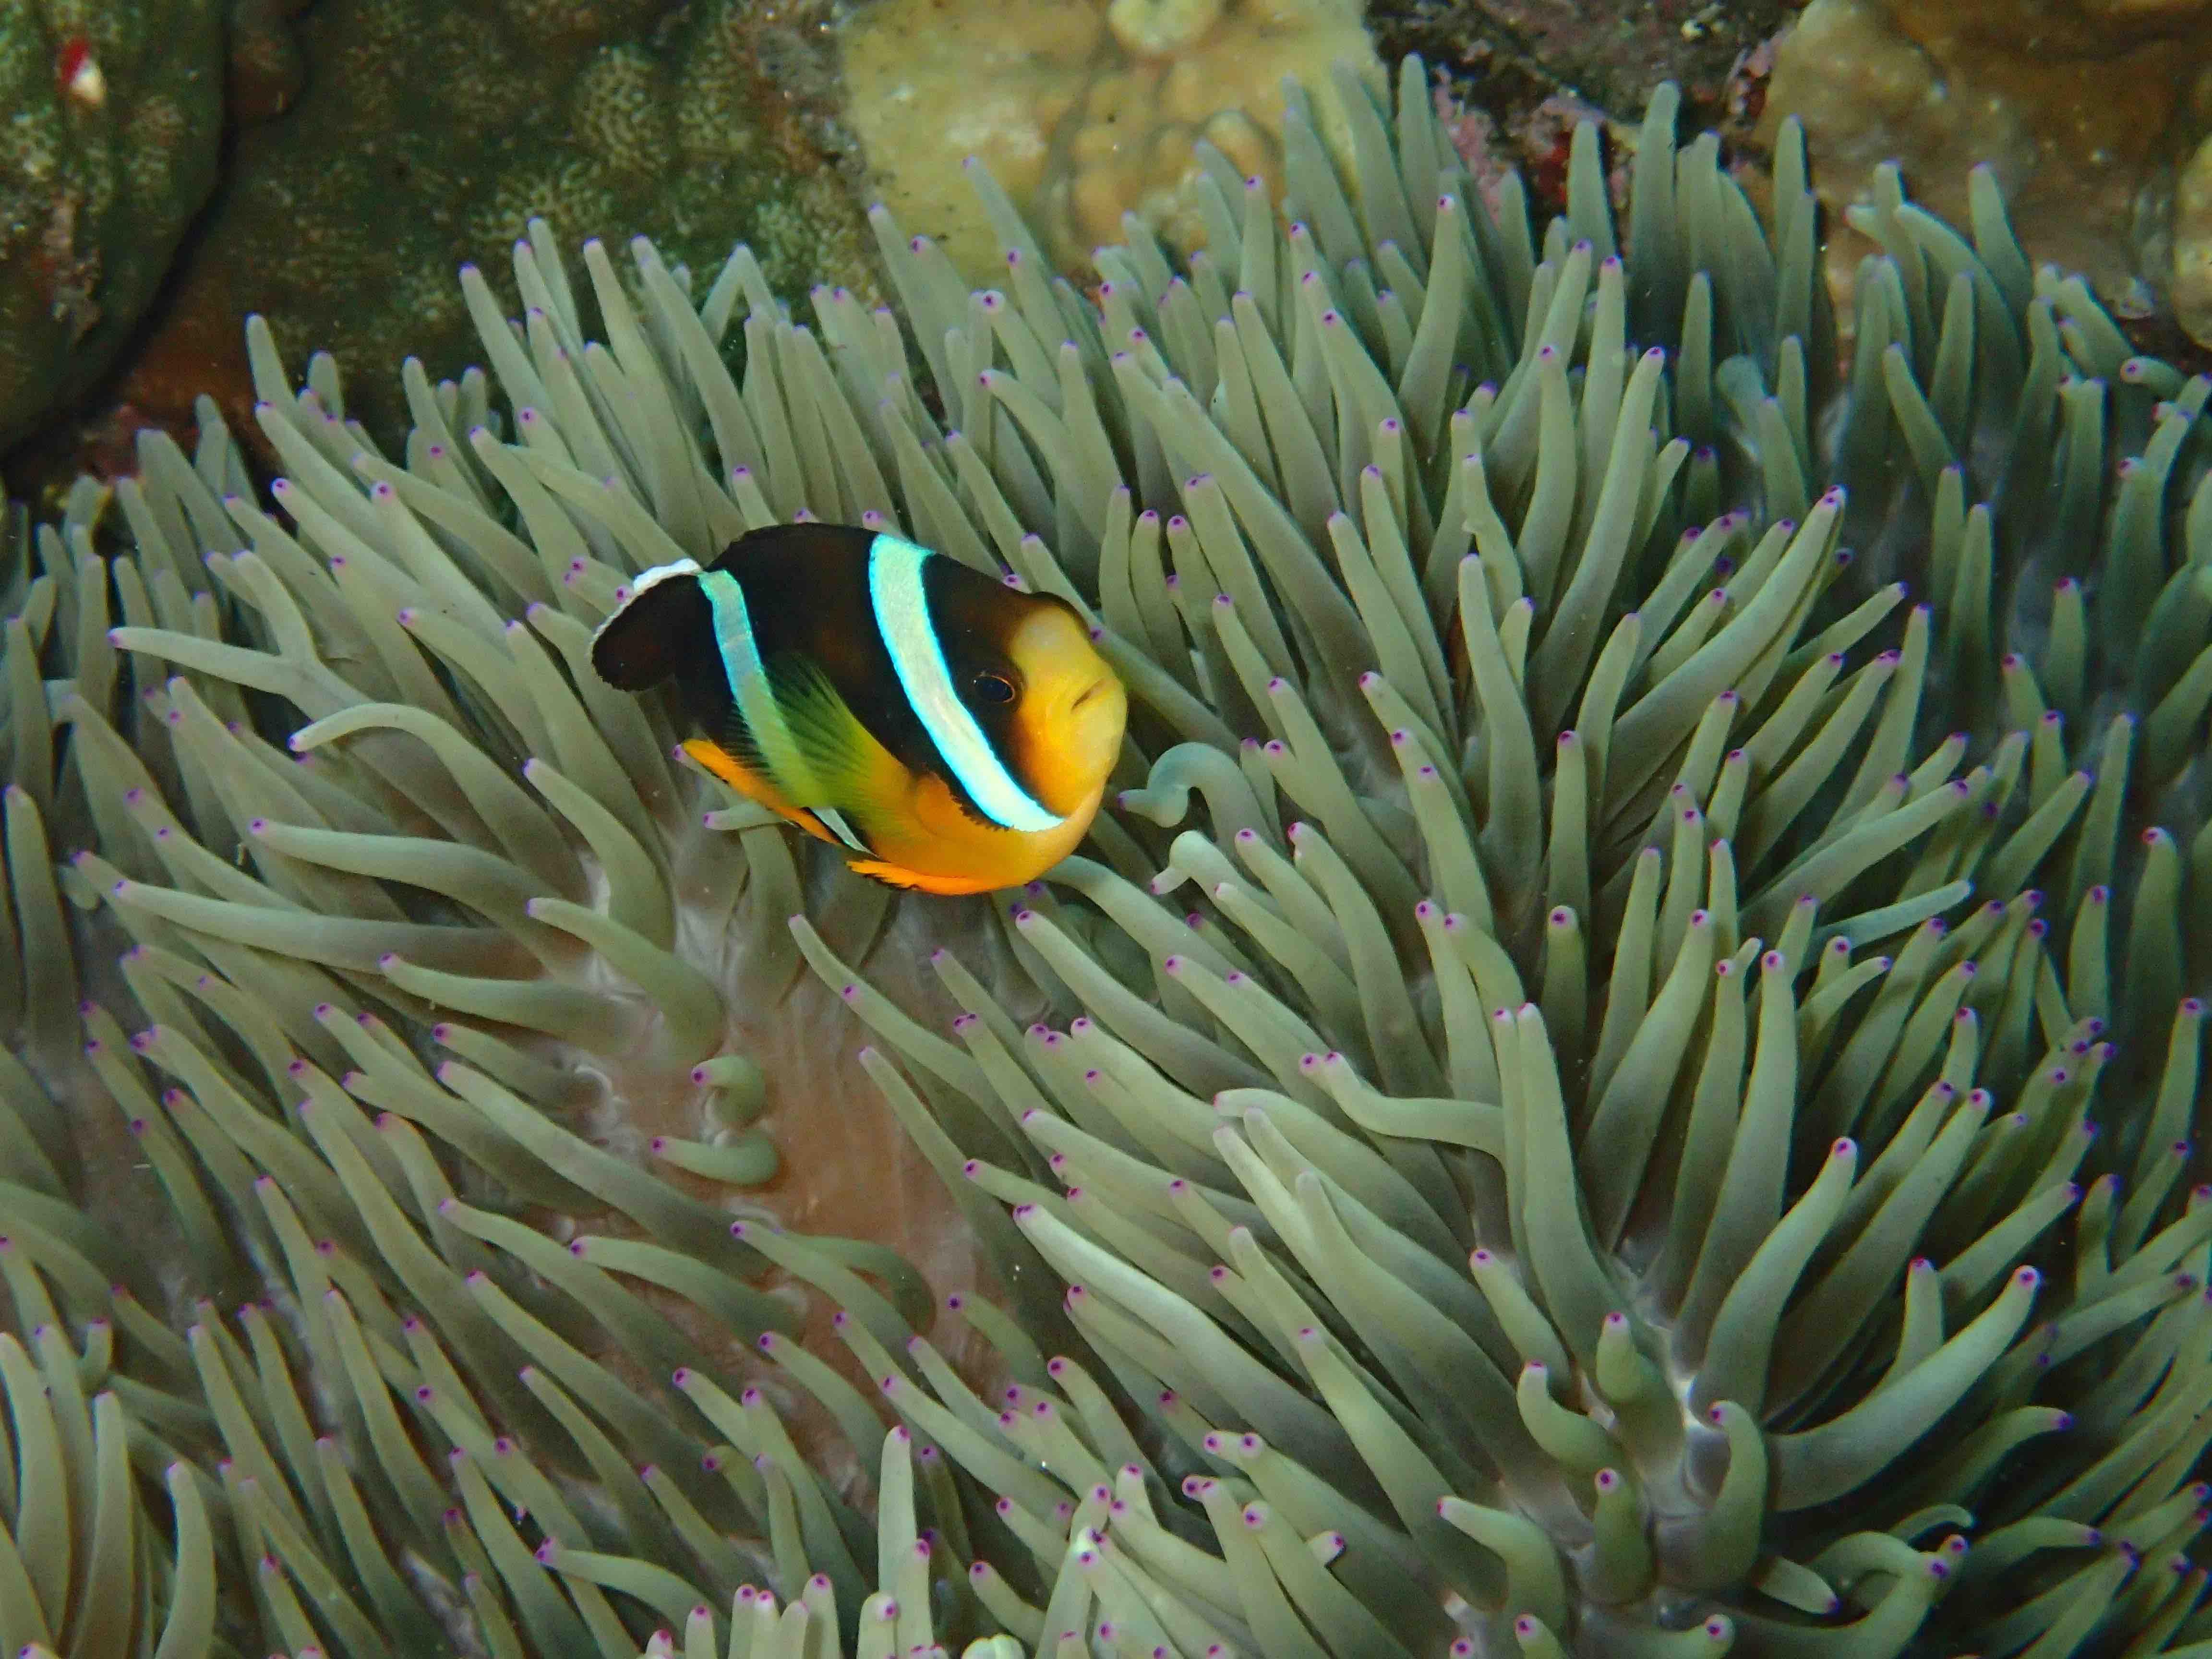 http://www.aquamarine-dive.net/blog/index.html/2016/05/15/P5240174.jpg